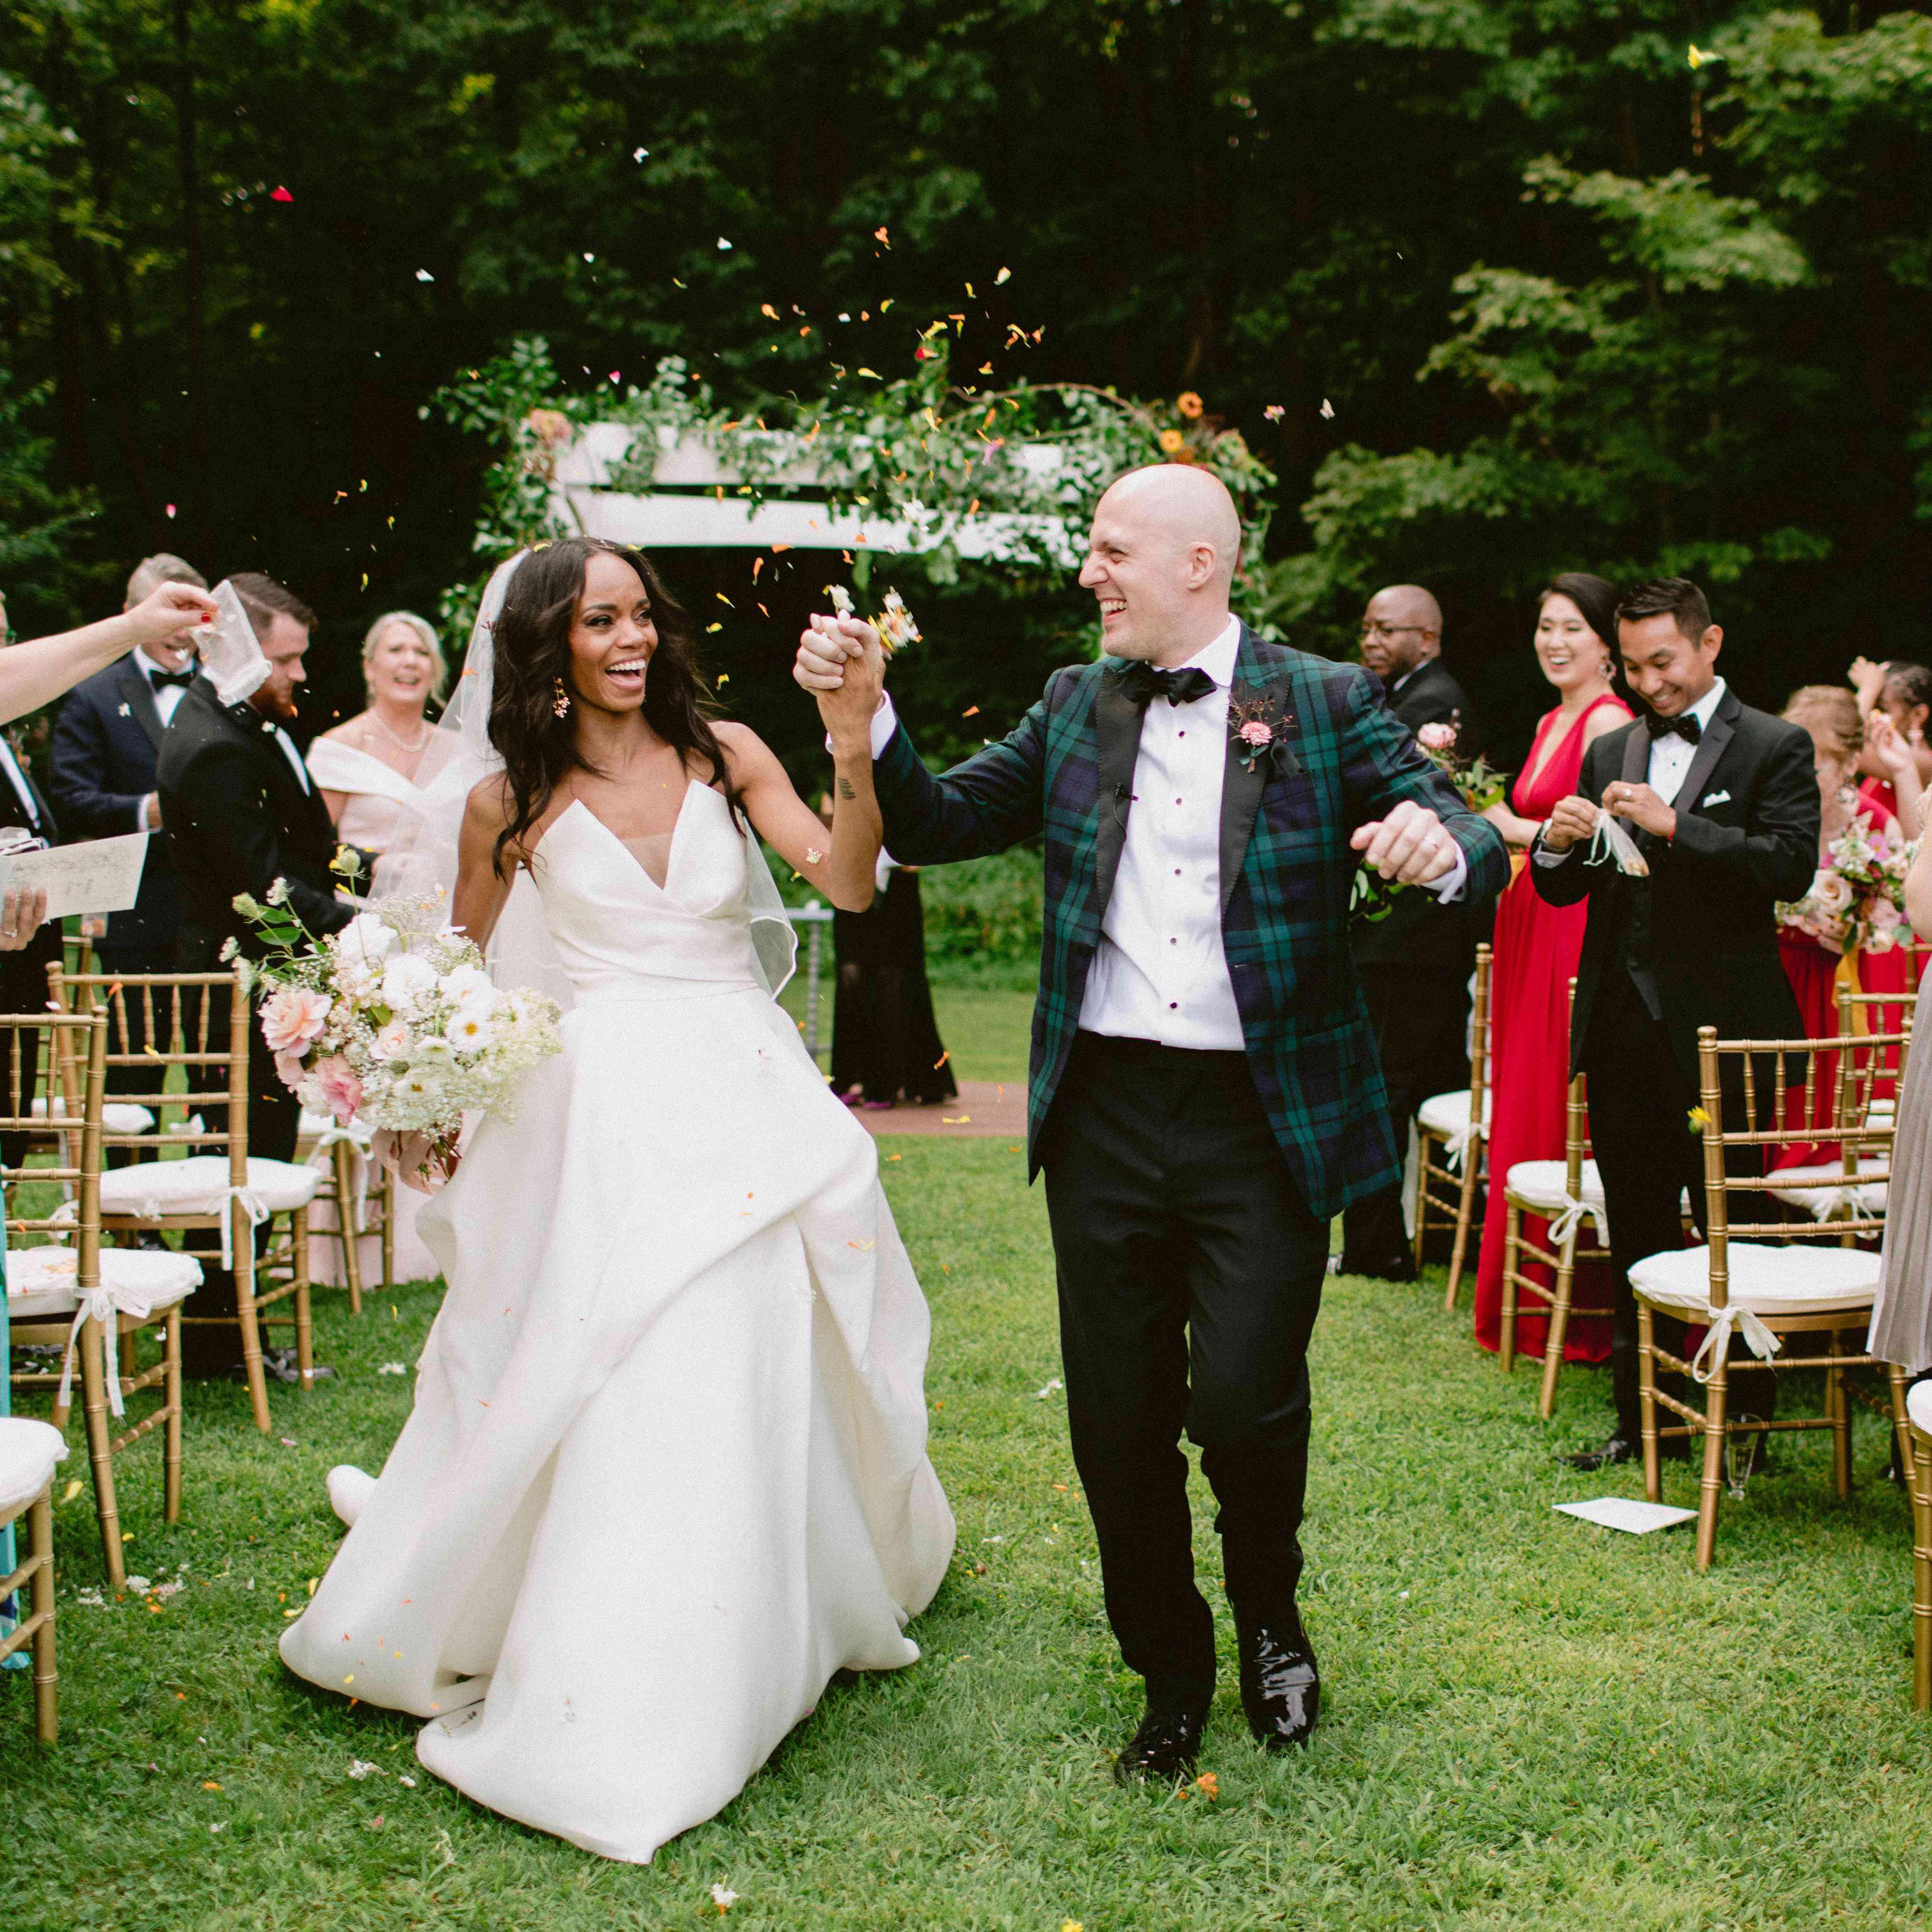 Small Wedding Photo Ideas: 61 Summer Wedding Ideas We Can't Get Enough Of